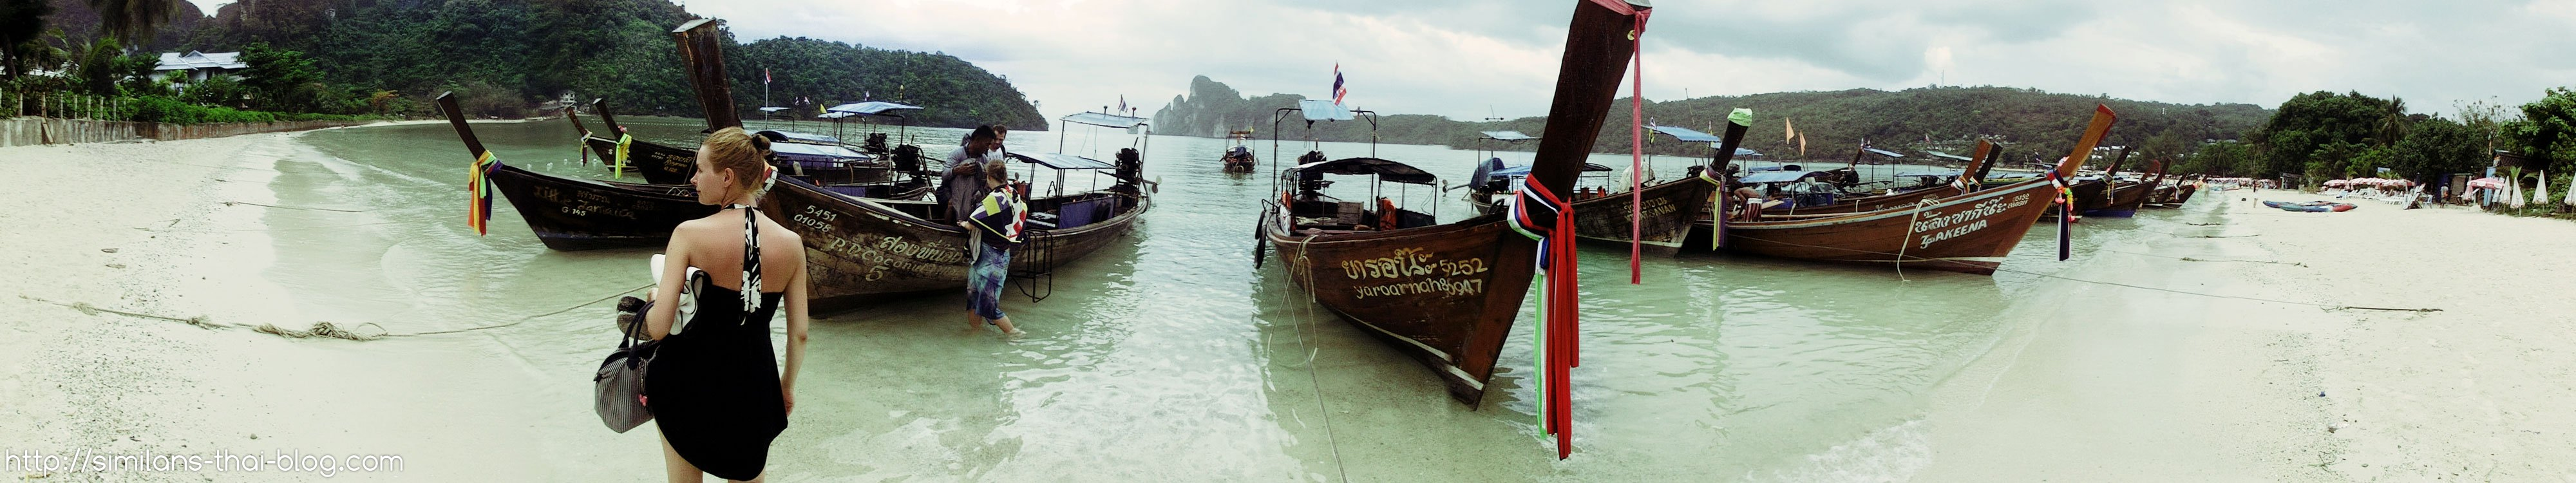 longtail-boats-phi-phi-don-beach